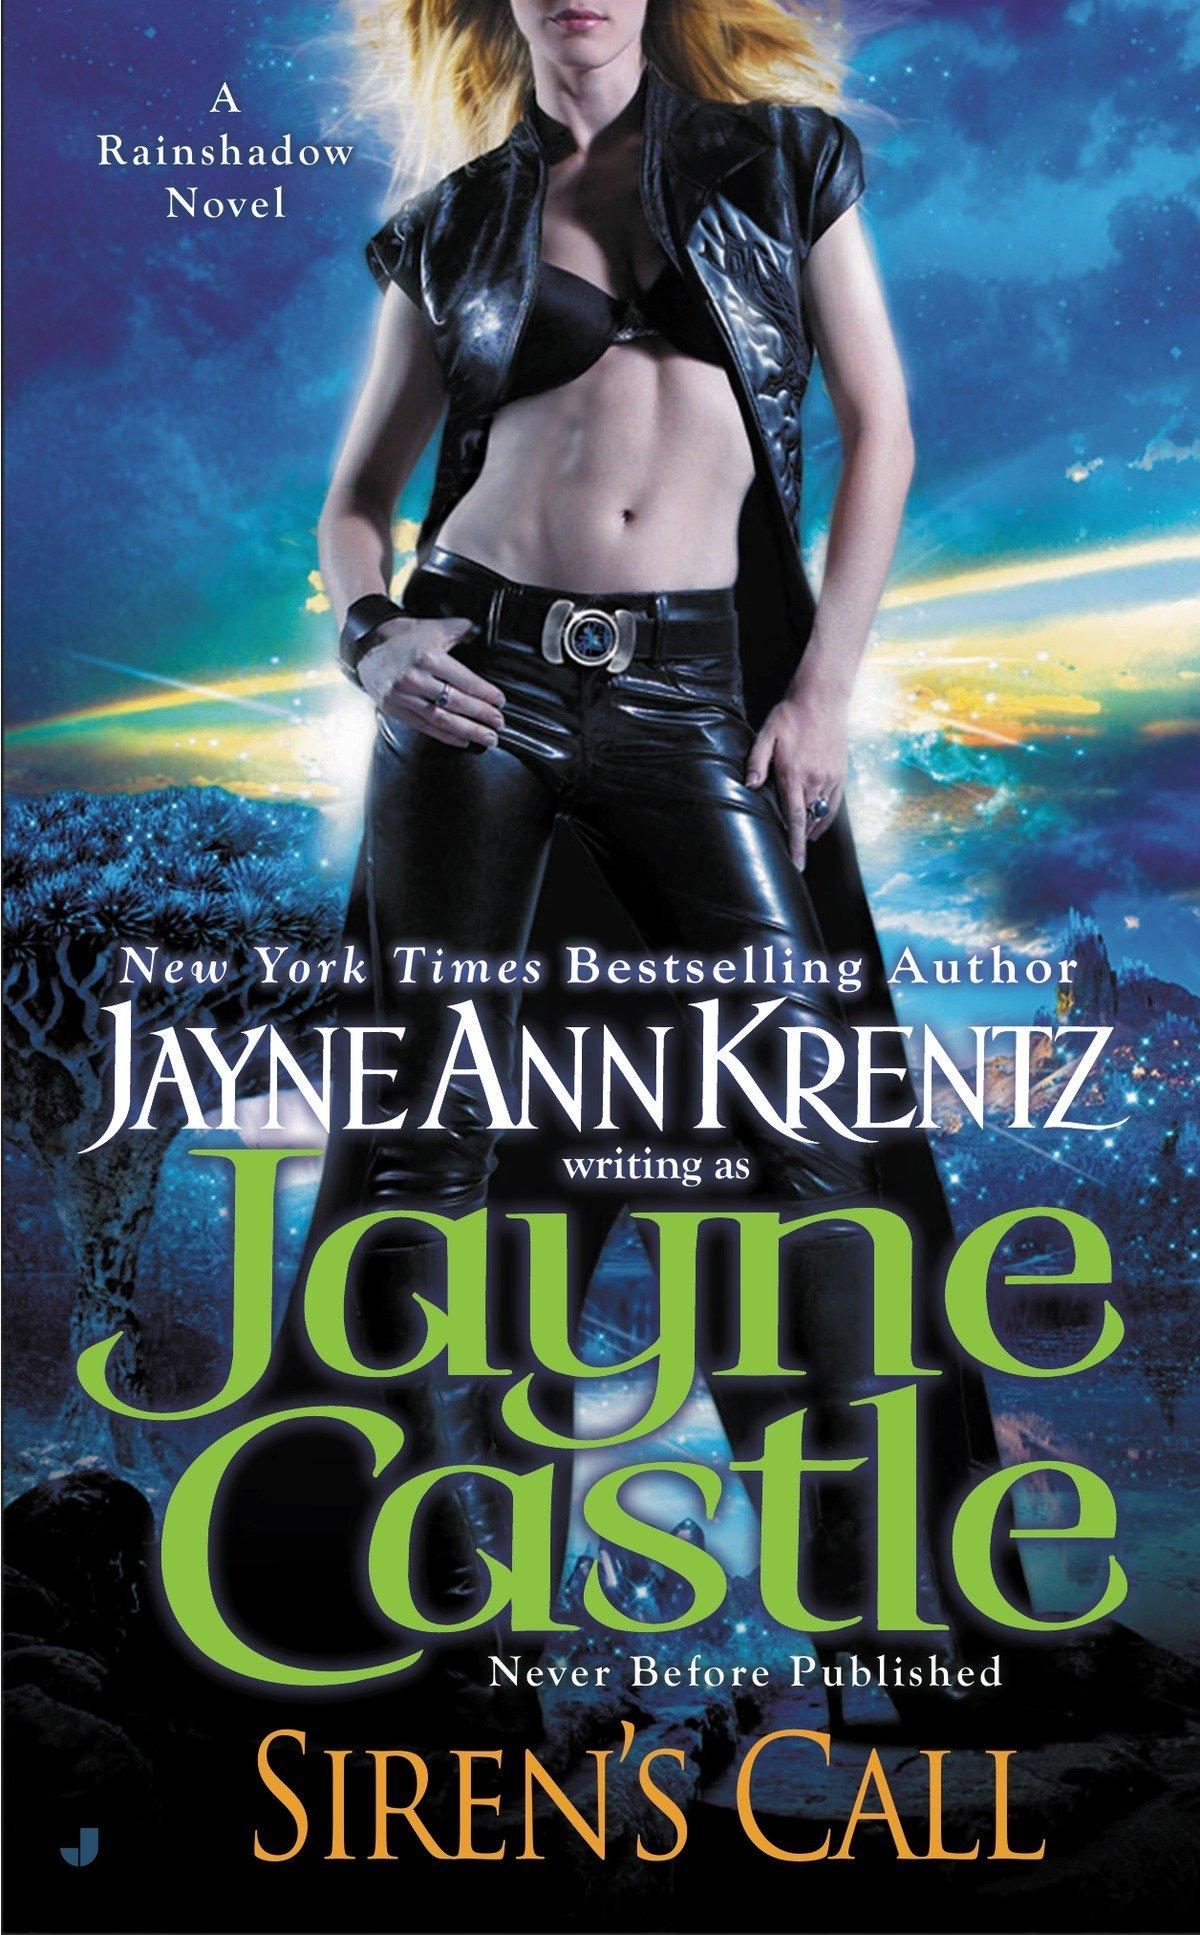 Read Online Siren's Call (A Rainshadow Novel) ebook